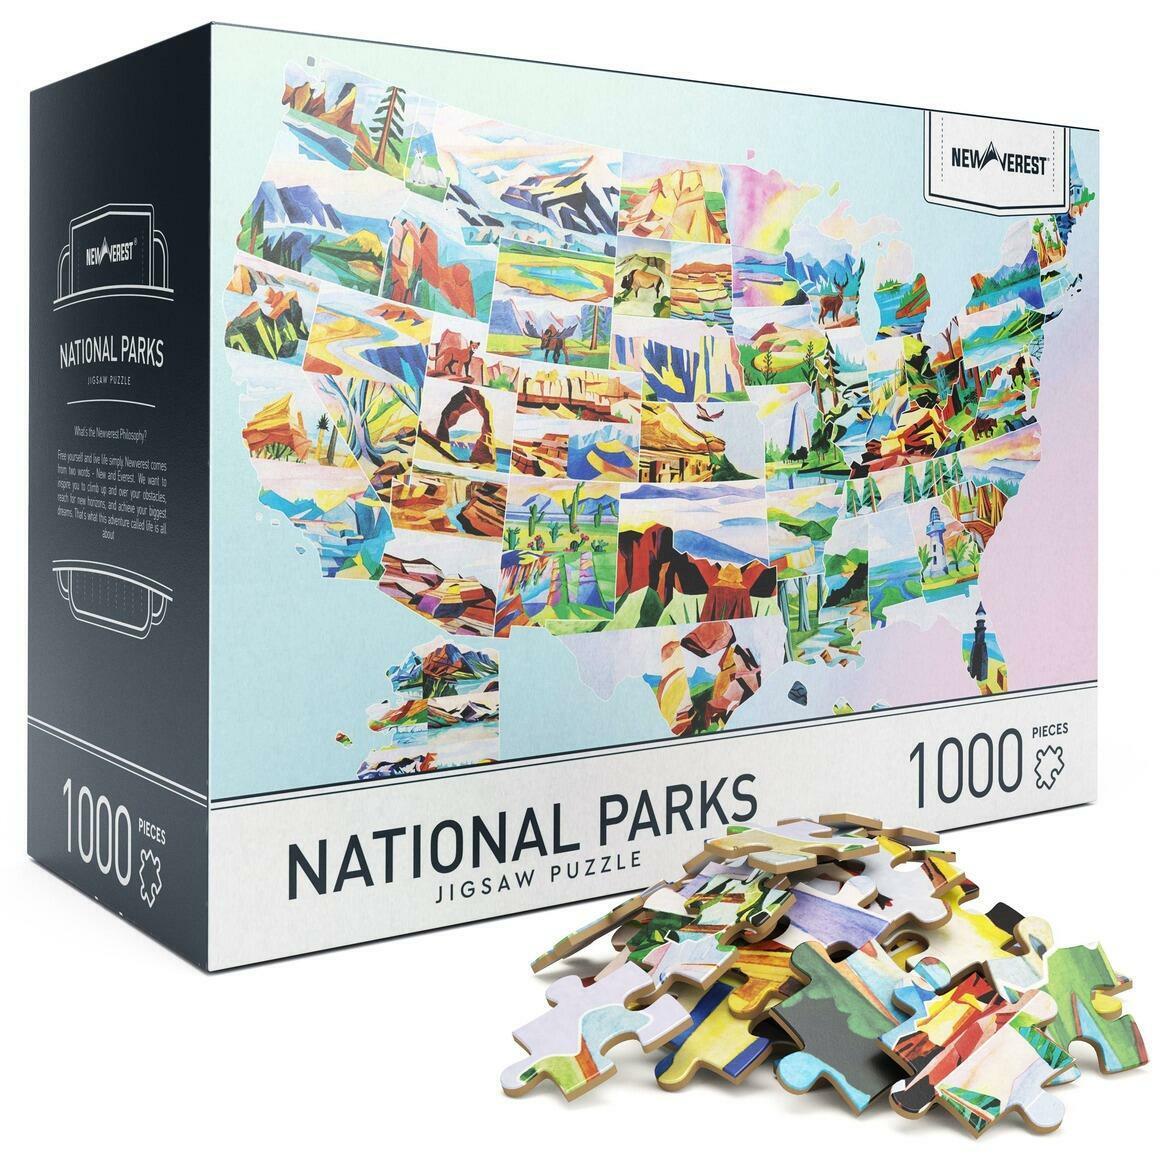 1000 pcs Newverest National Parks Jigsaw Puzzles | Trada Marketplace